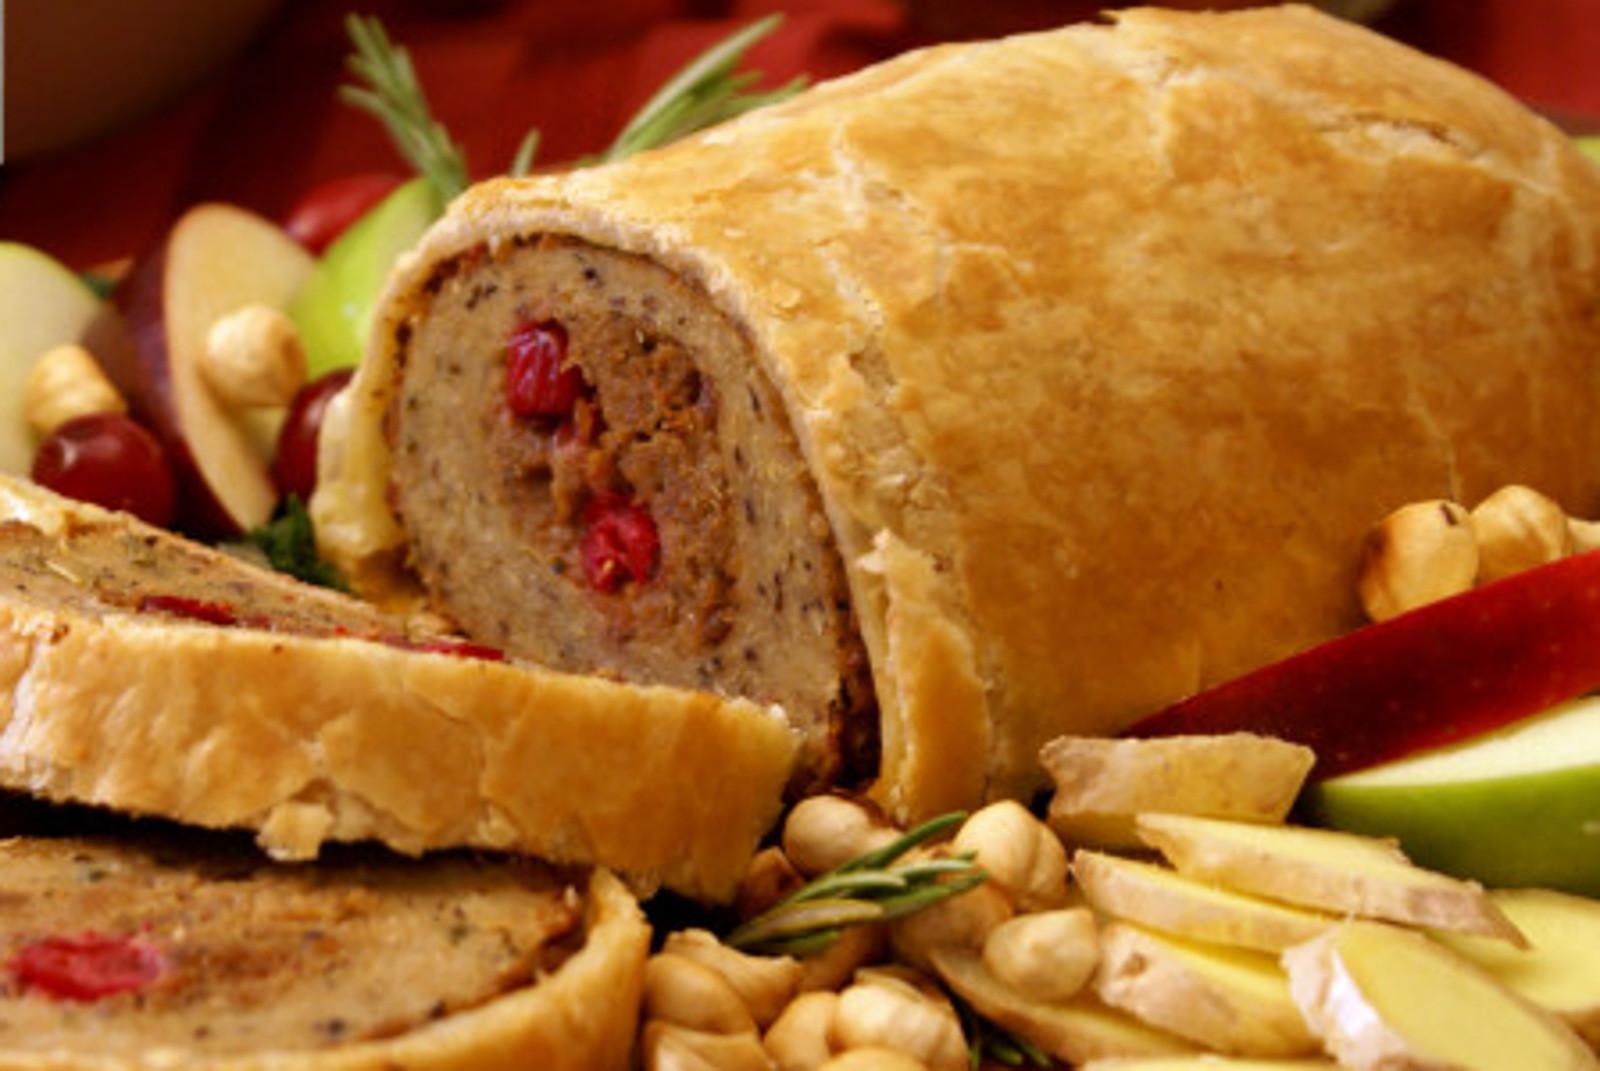 Thanksgiving Alternatives To Turkey  The Best Meatless Turkey Alternatives for Thanksgiving